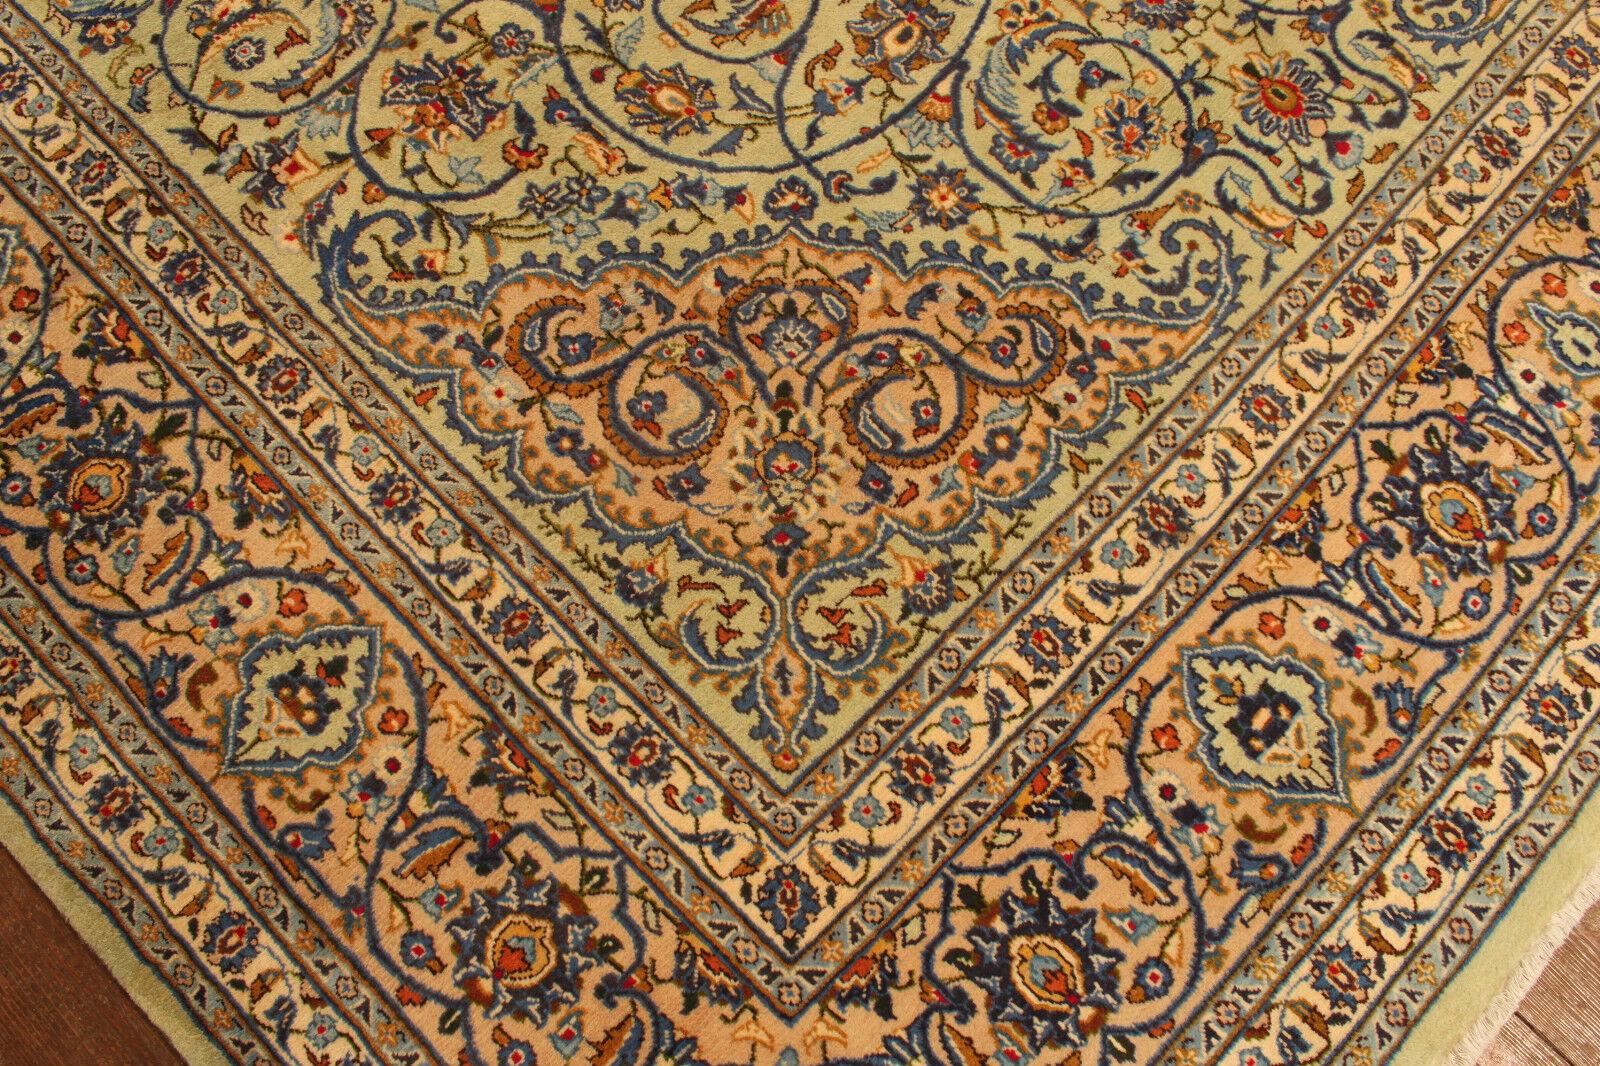 TAPPETO Orientale Vero Annodato Tapis Tapis Tapis persan (398 x 290) cm Ottimo Stato 4001 0326b9